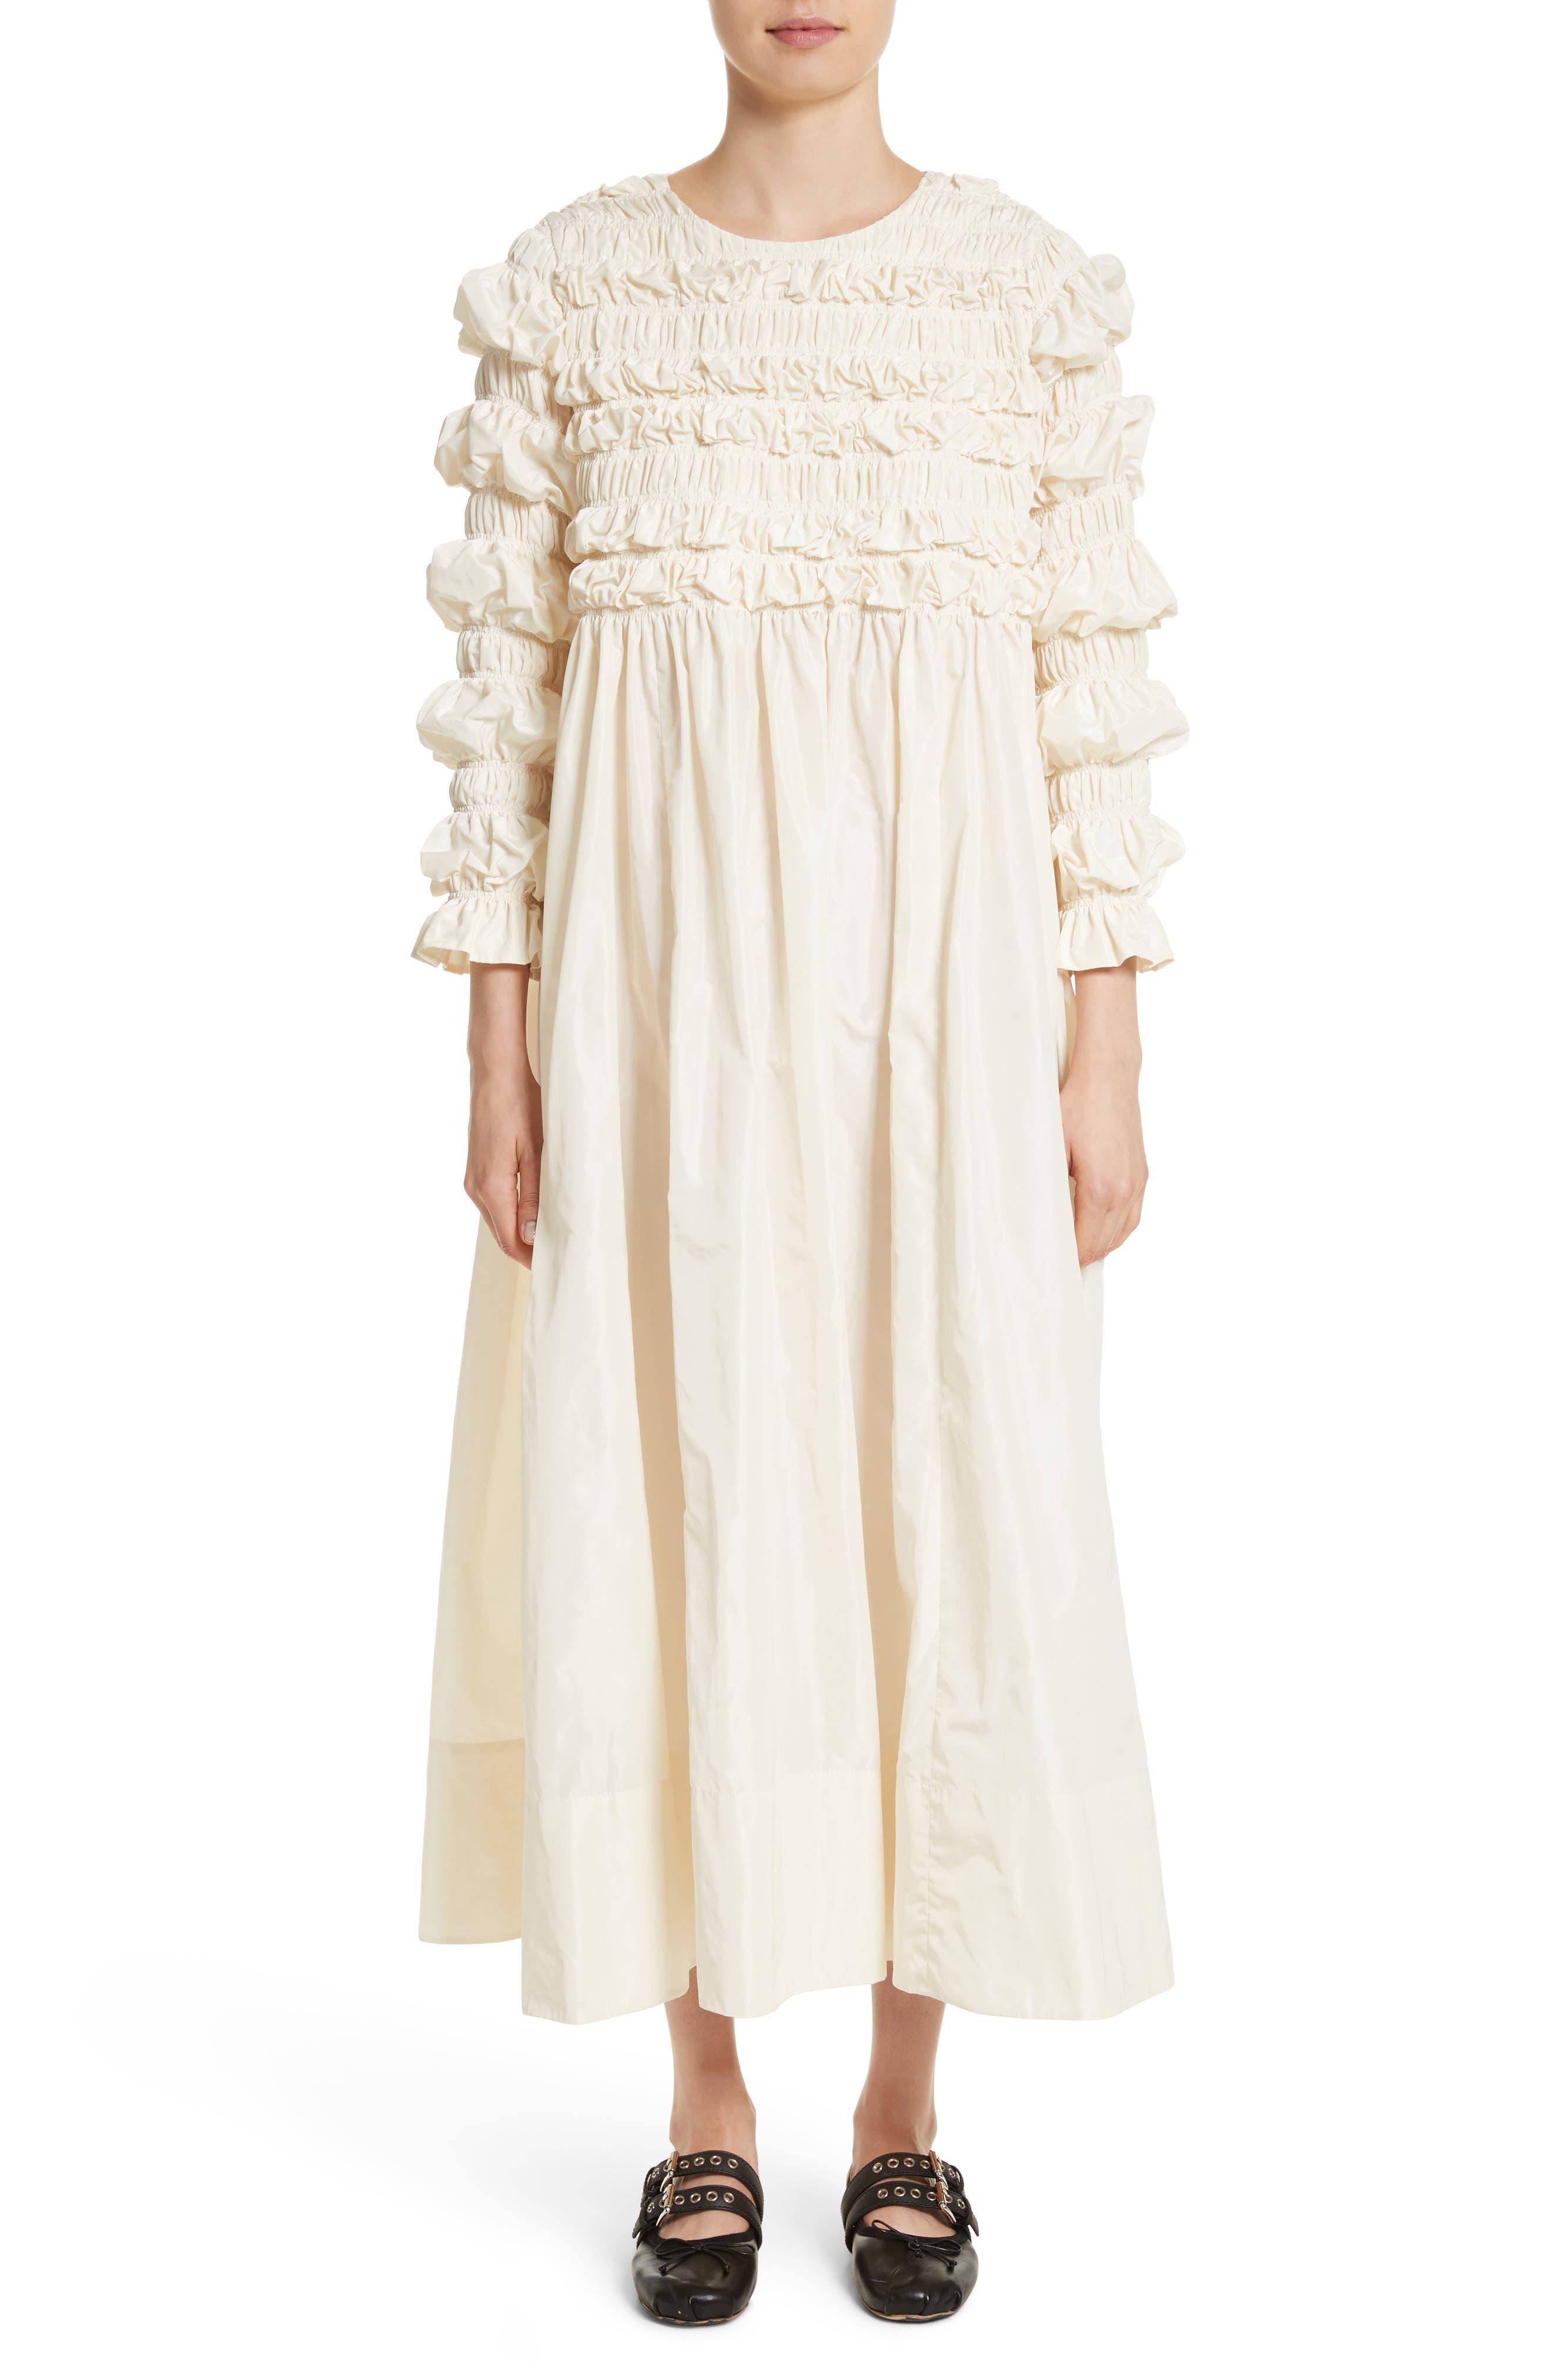 Main Image - Molly Goddard Lizzie Ruffled Taffeta Dress